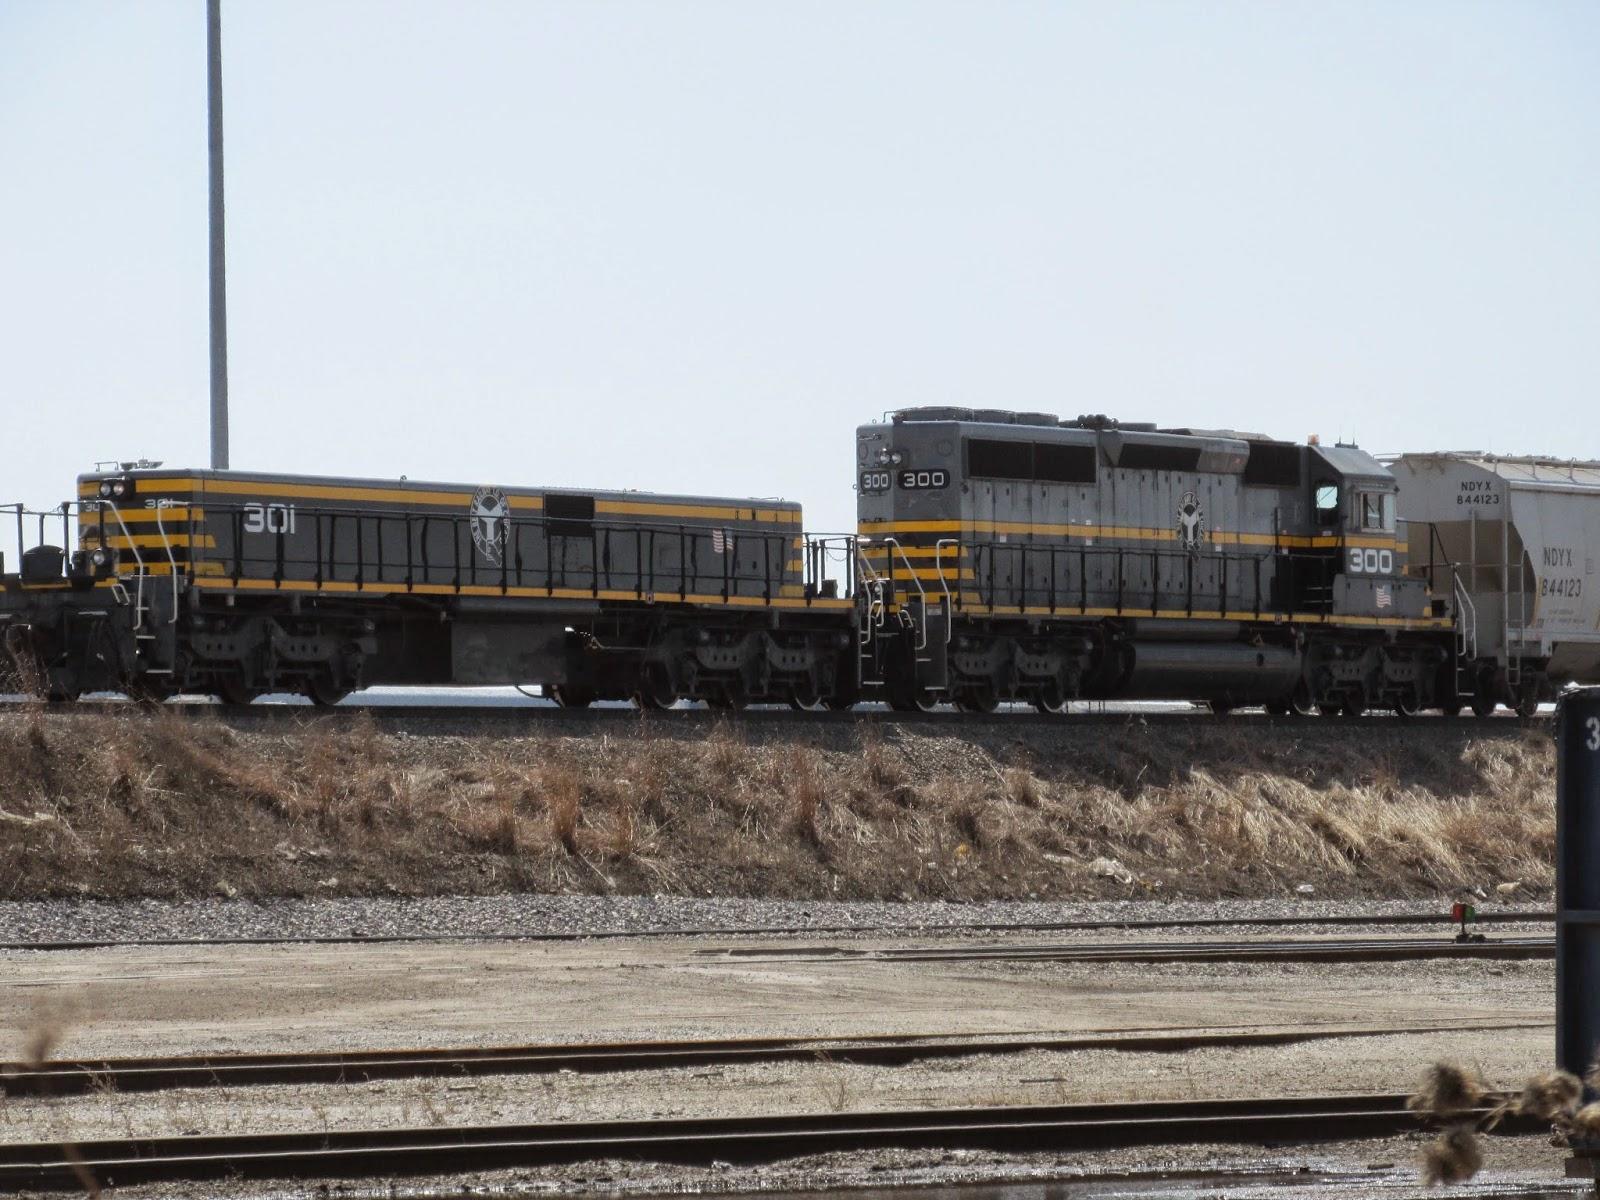 Eddie's Rail Fan Page: Hump yard switching at the Belt